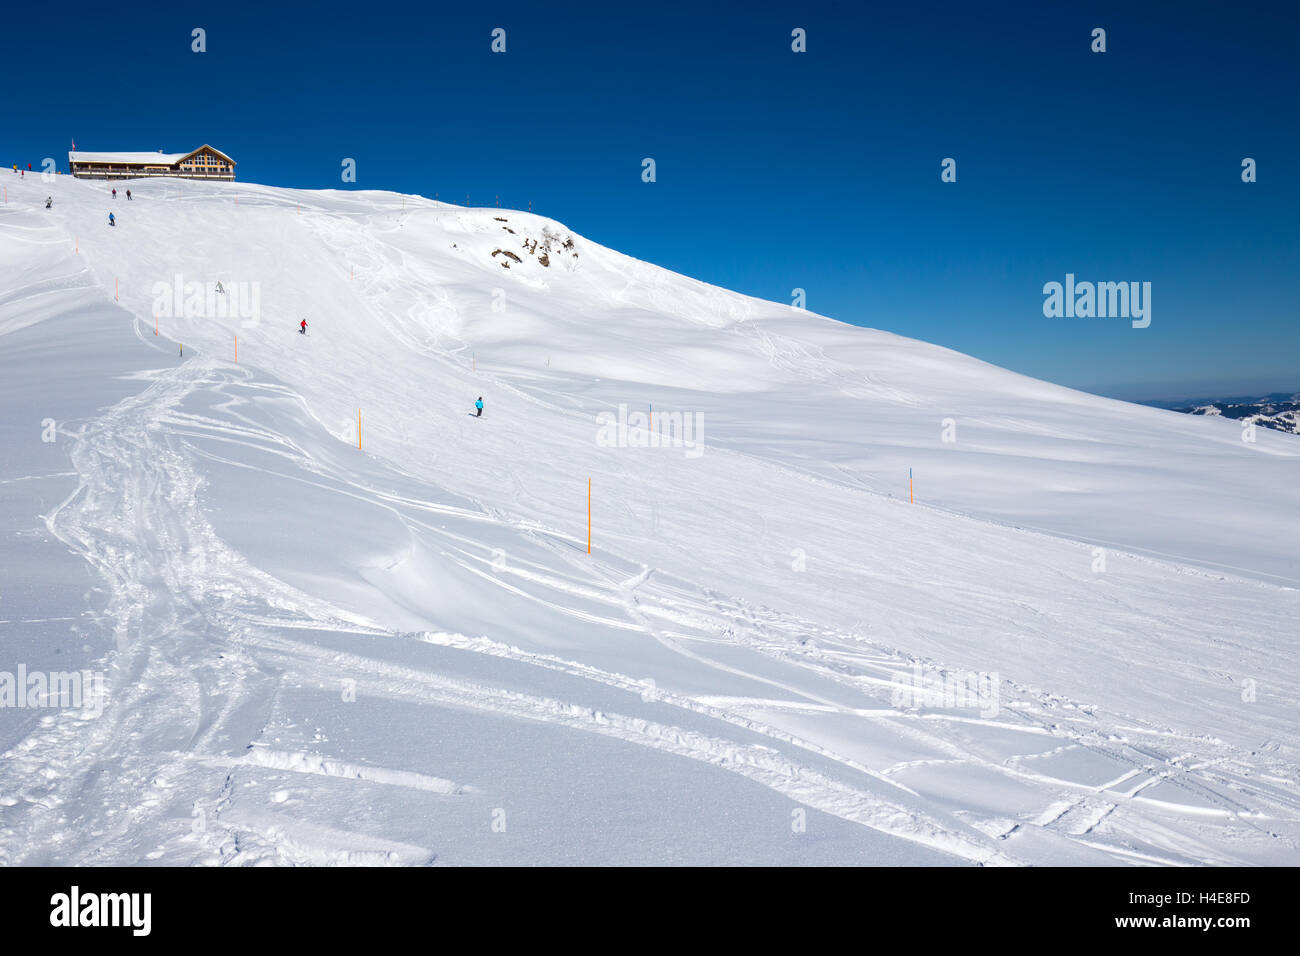 Skiers skiing on ski slopes on the top of Hoch Ybrig resort, Switzerland - Stock Image